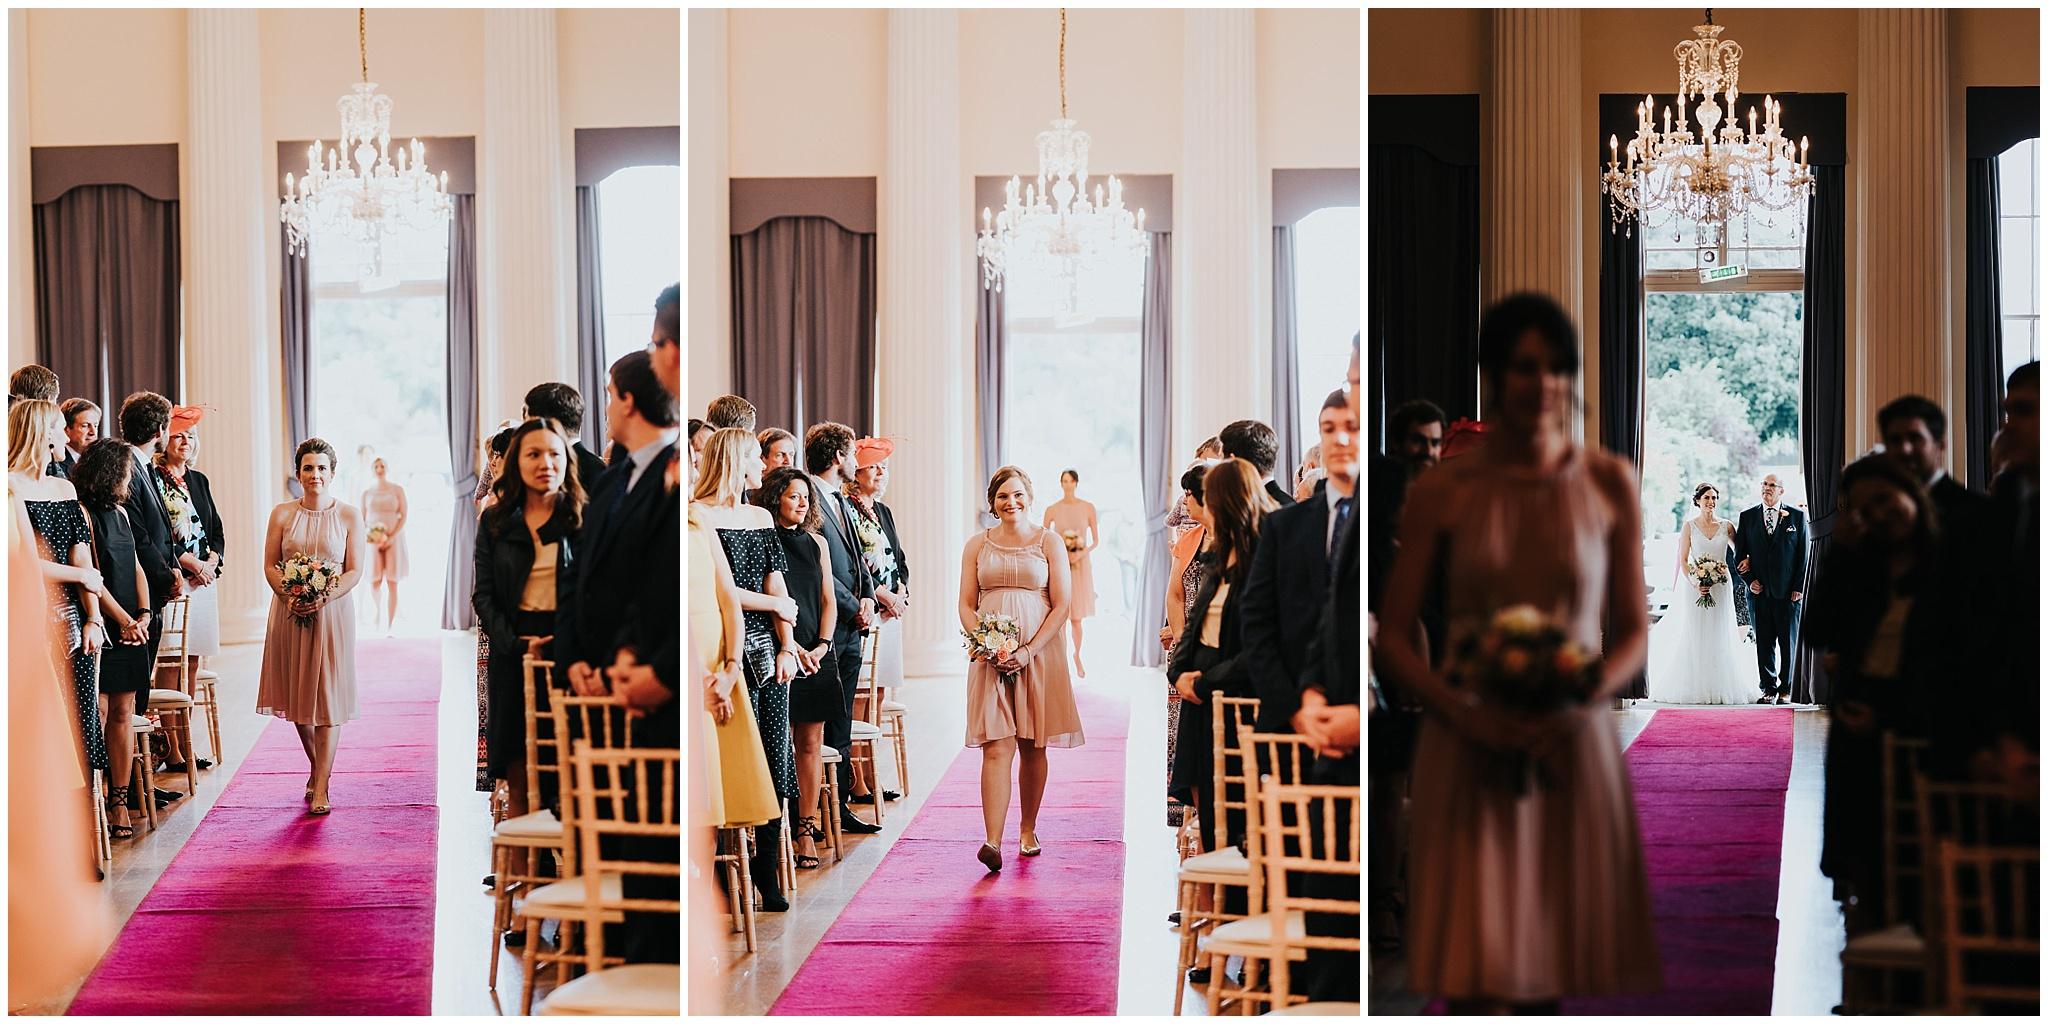 Stanway House Gloucester wedding photography030